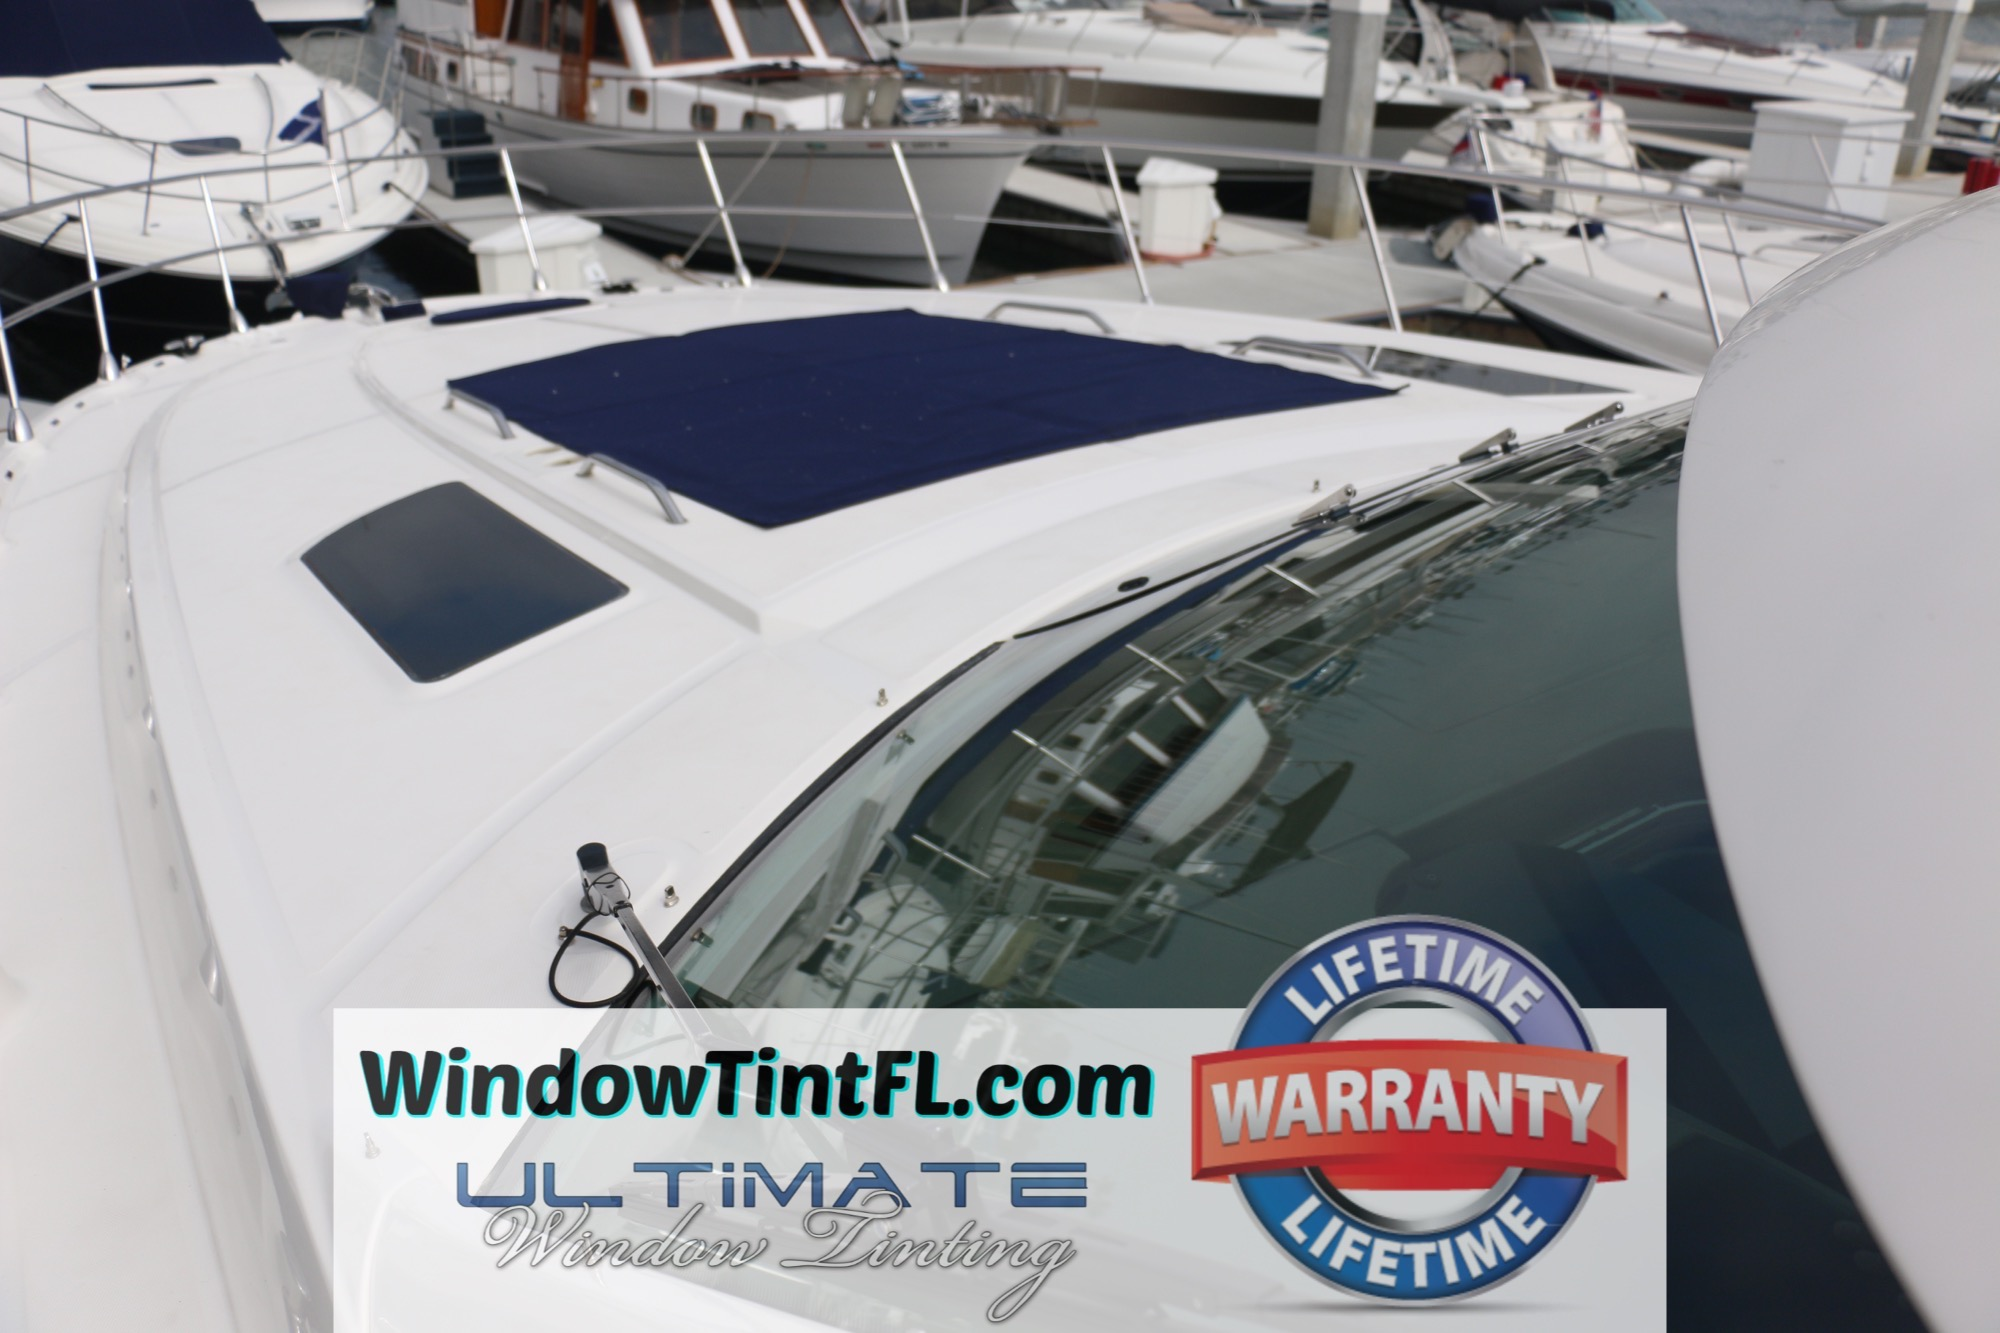 Boat Window Tint Sarasota Florida Marine Solar Window Film